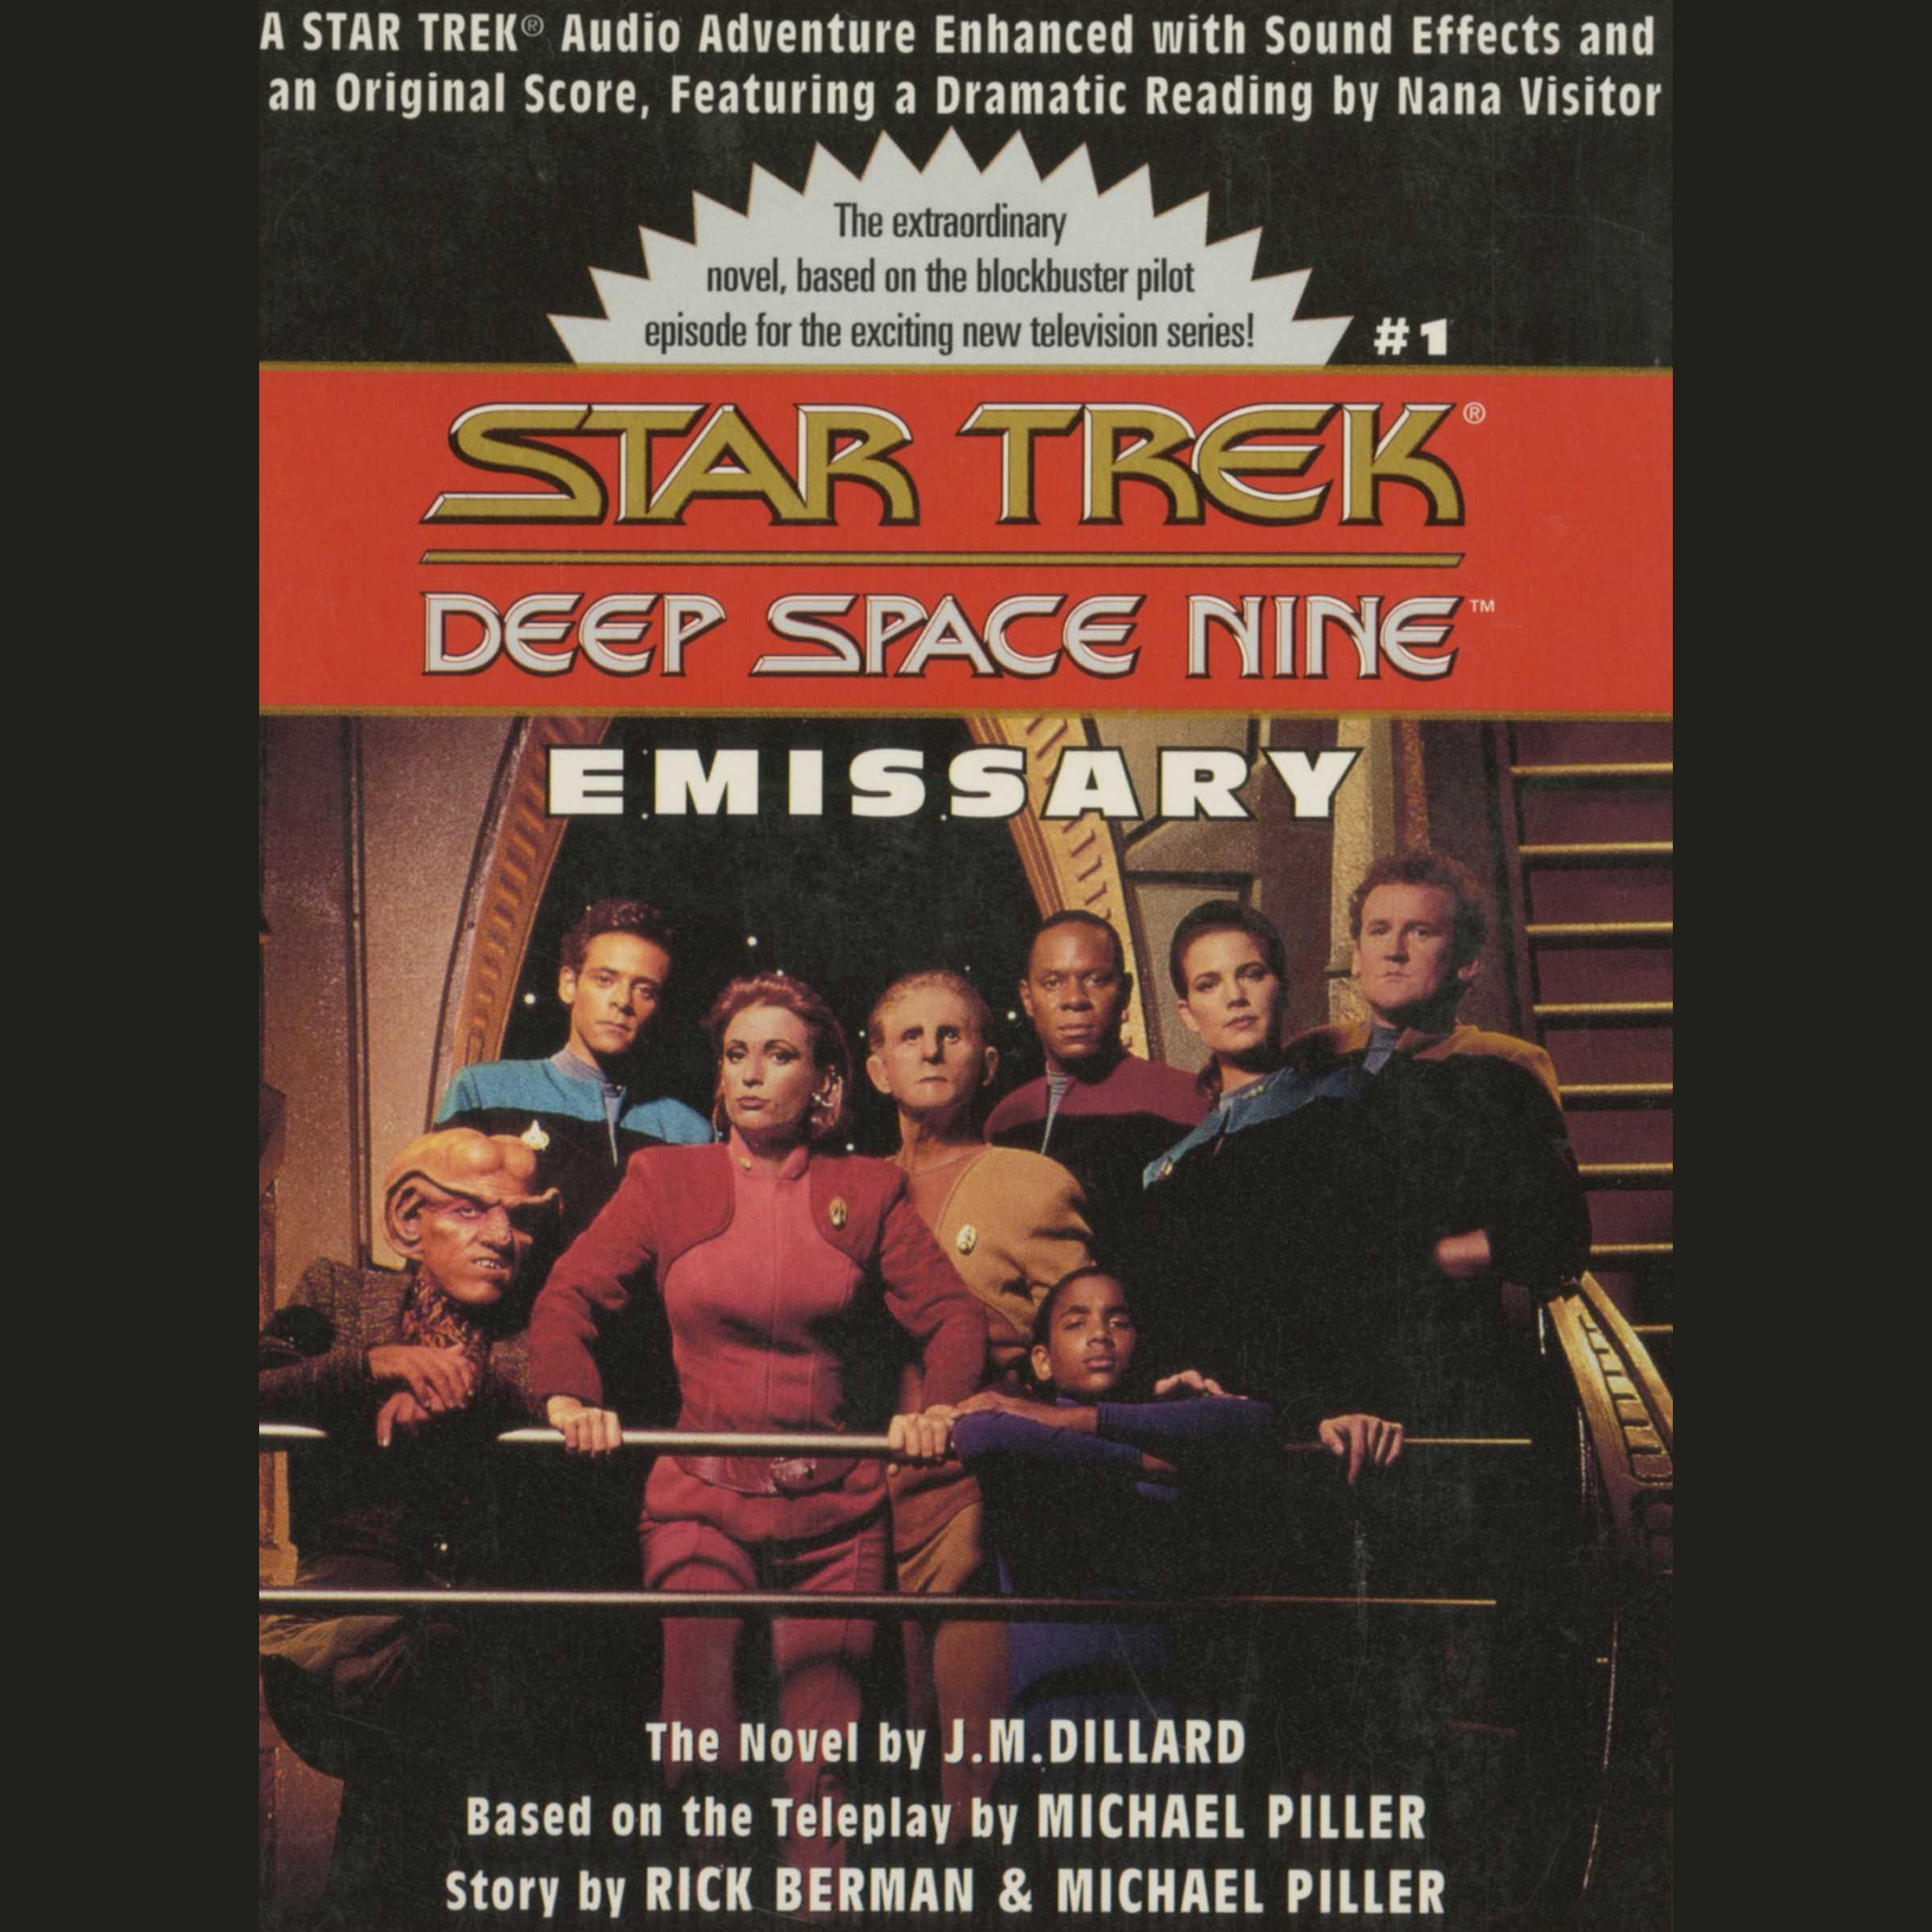 Star trek deep space nine emissary 9780743546225 hr